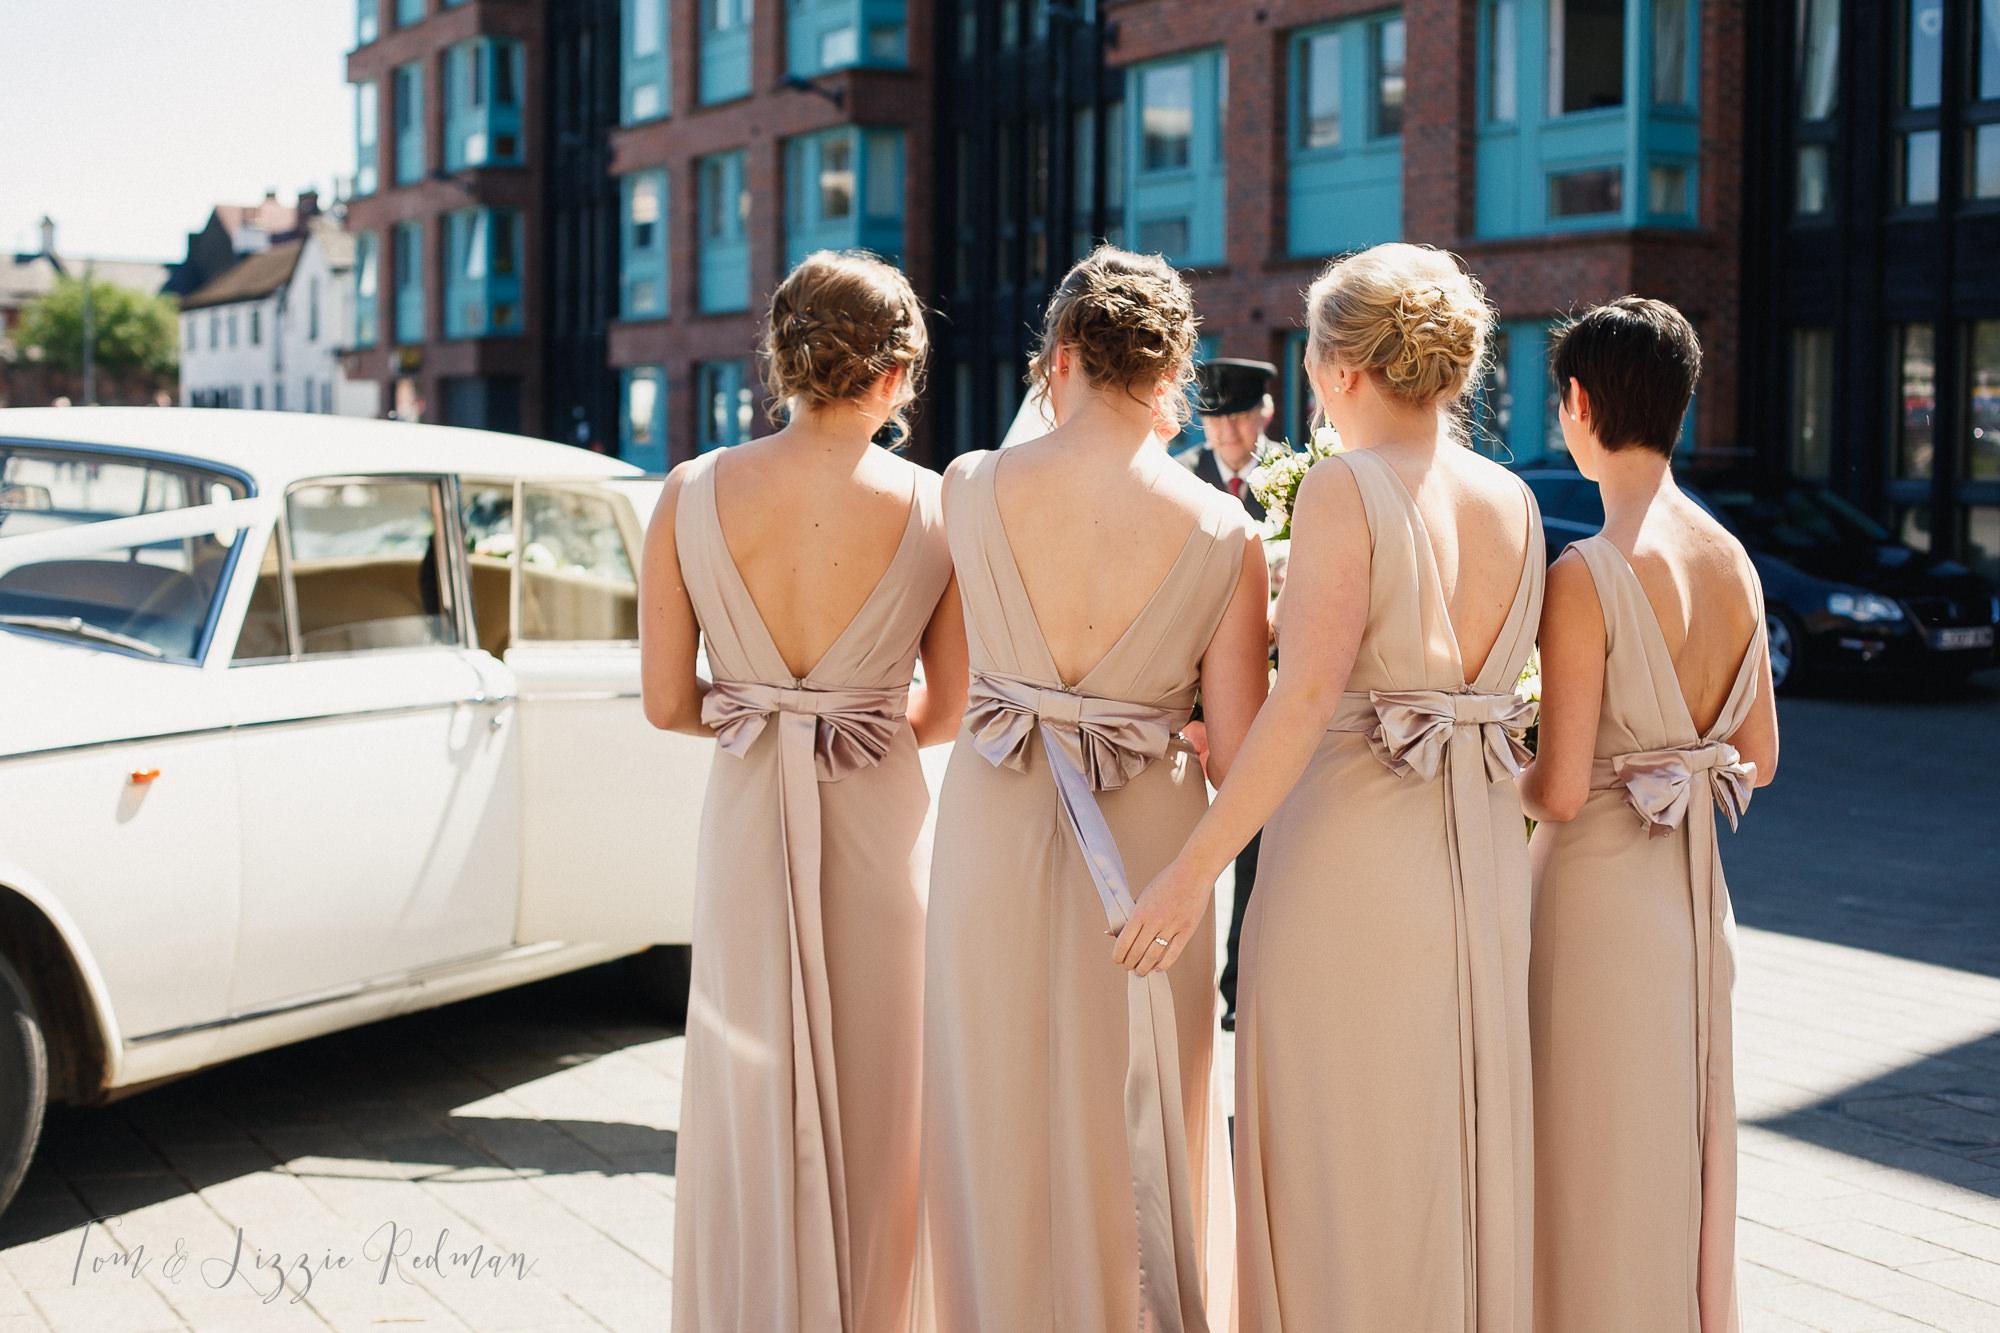 Dorset wedding photographers Tom & Lizzie Redman 015.jpg